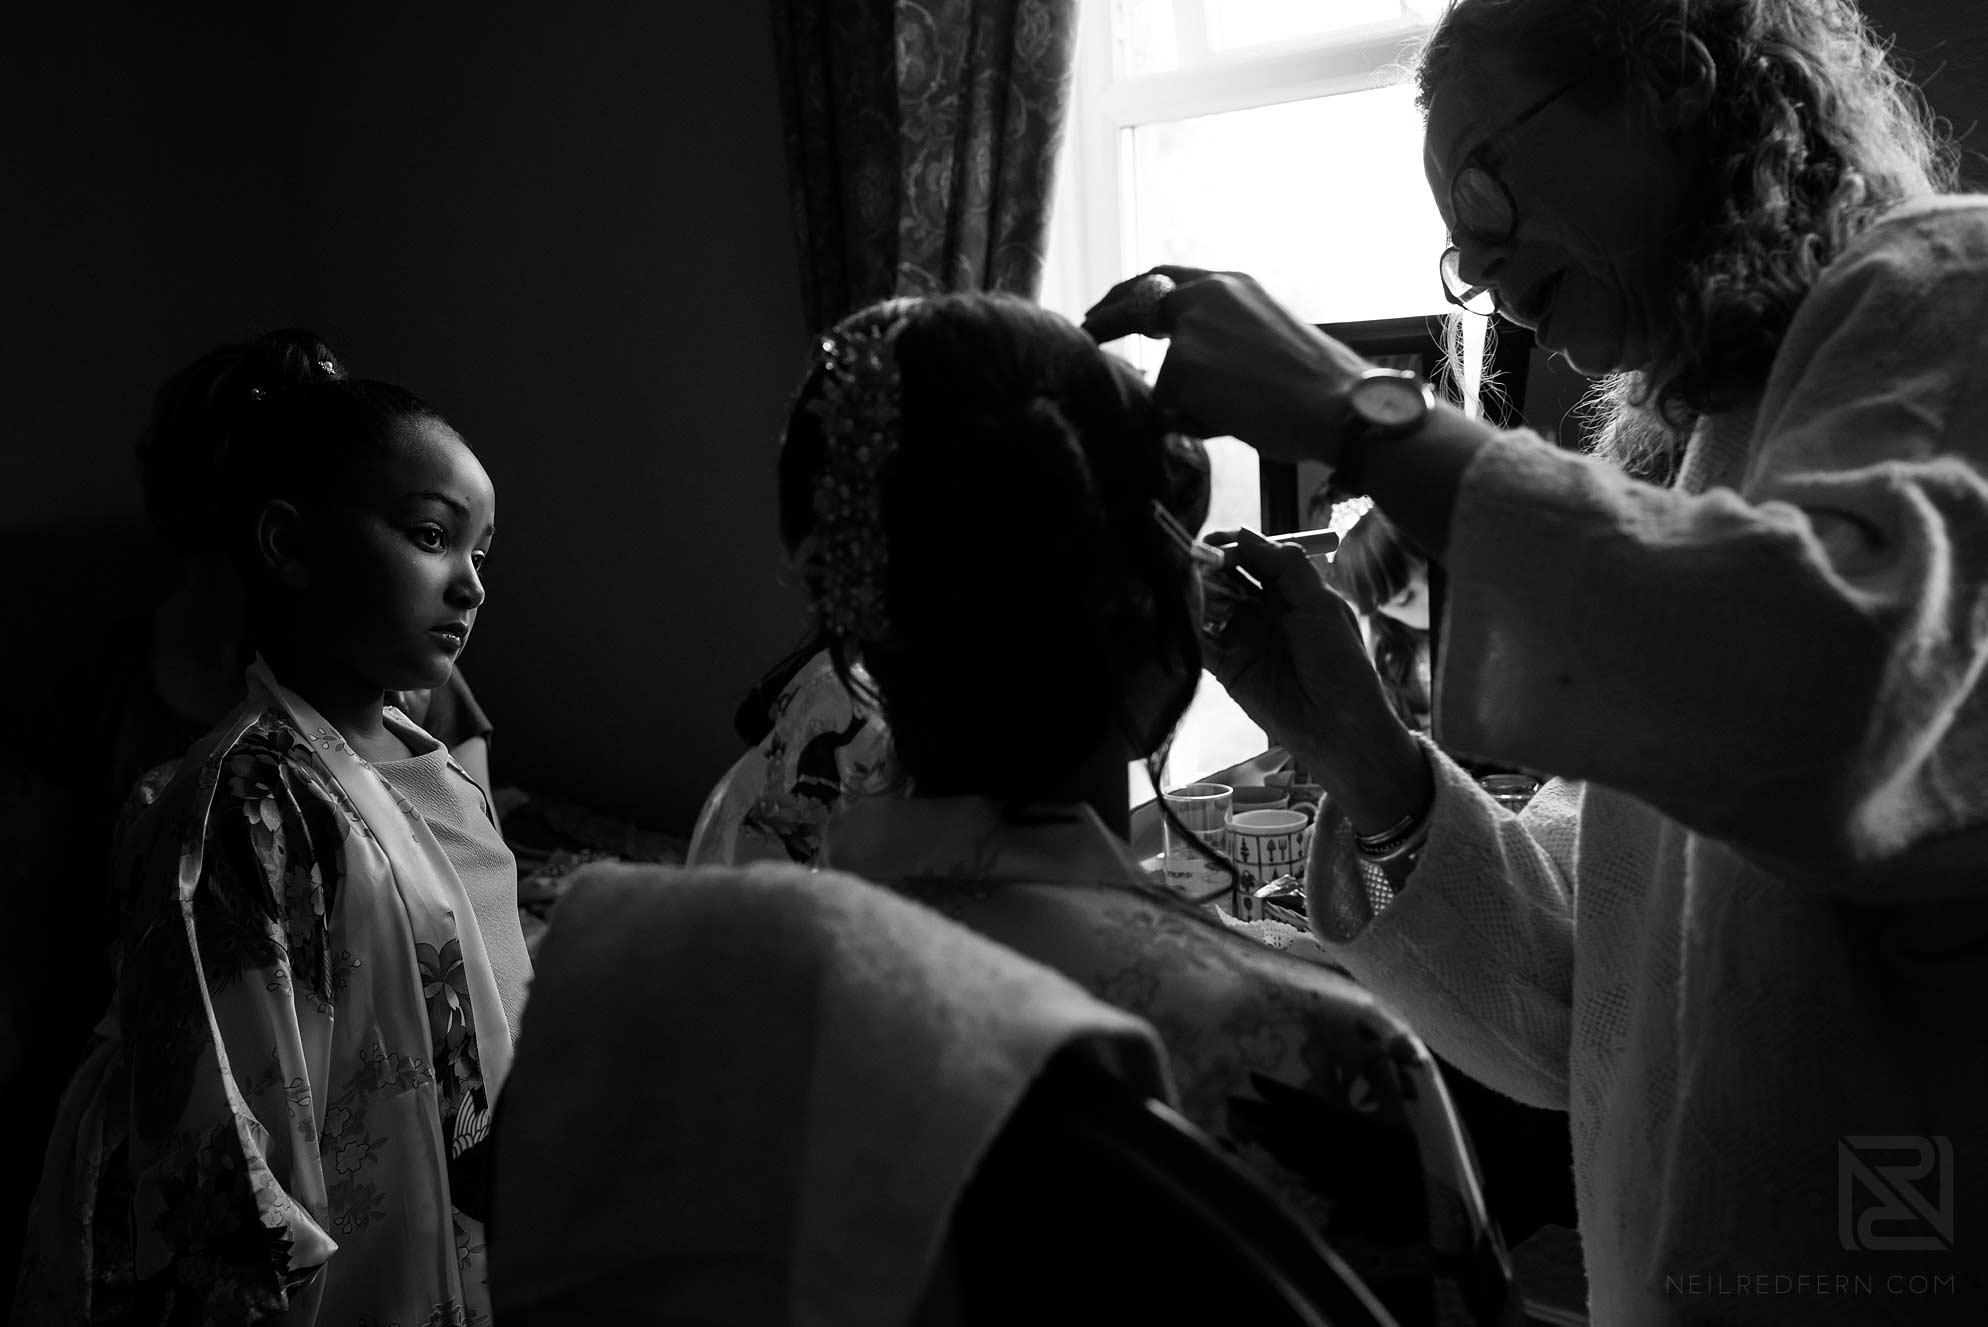 Metropole-Hotel-Llandrindod-Wells-wedding-05